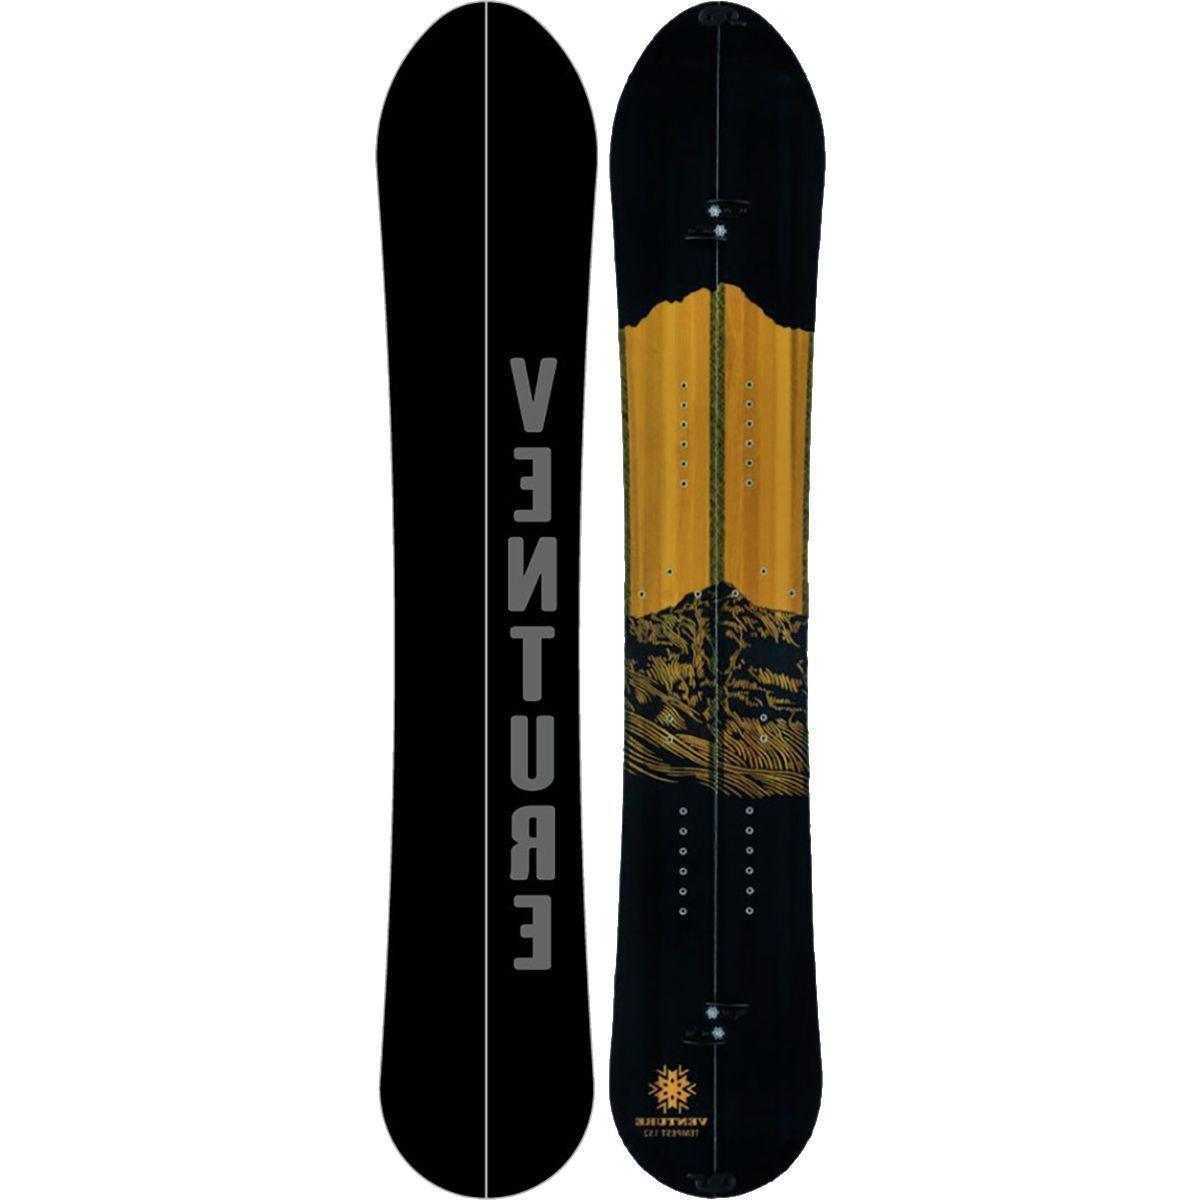 Venture Snowboards Tempest Split Snowboard - Women's